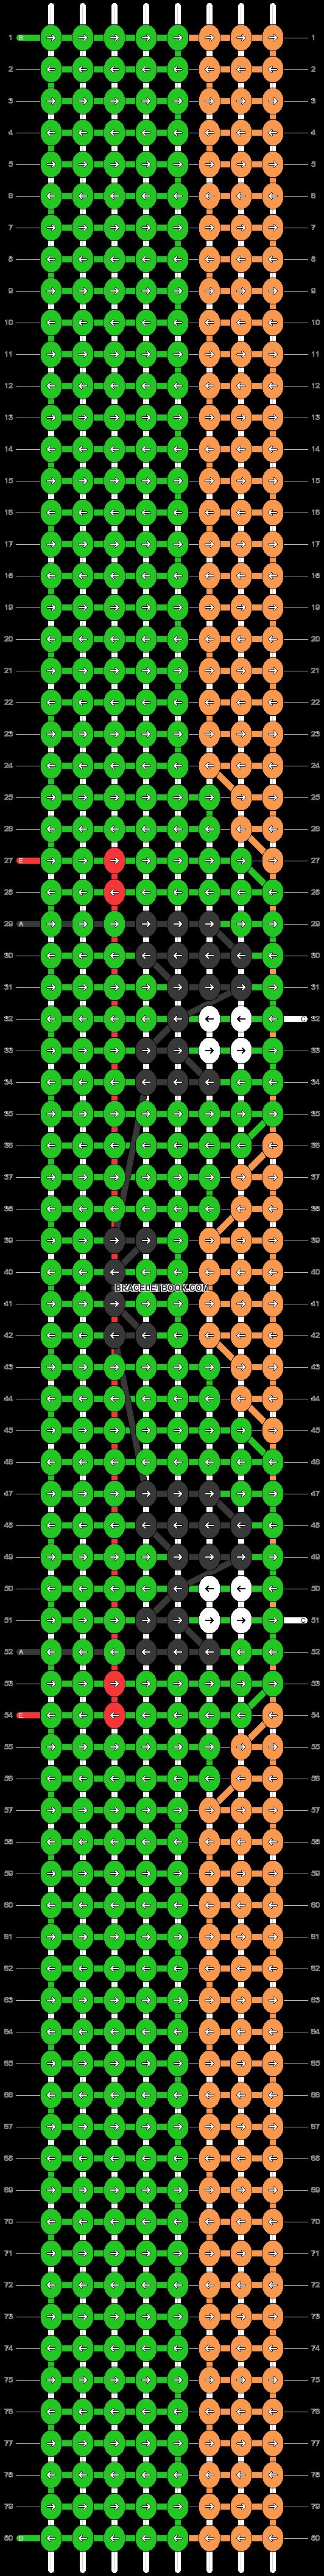 Alpha pattern #97608 pattern